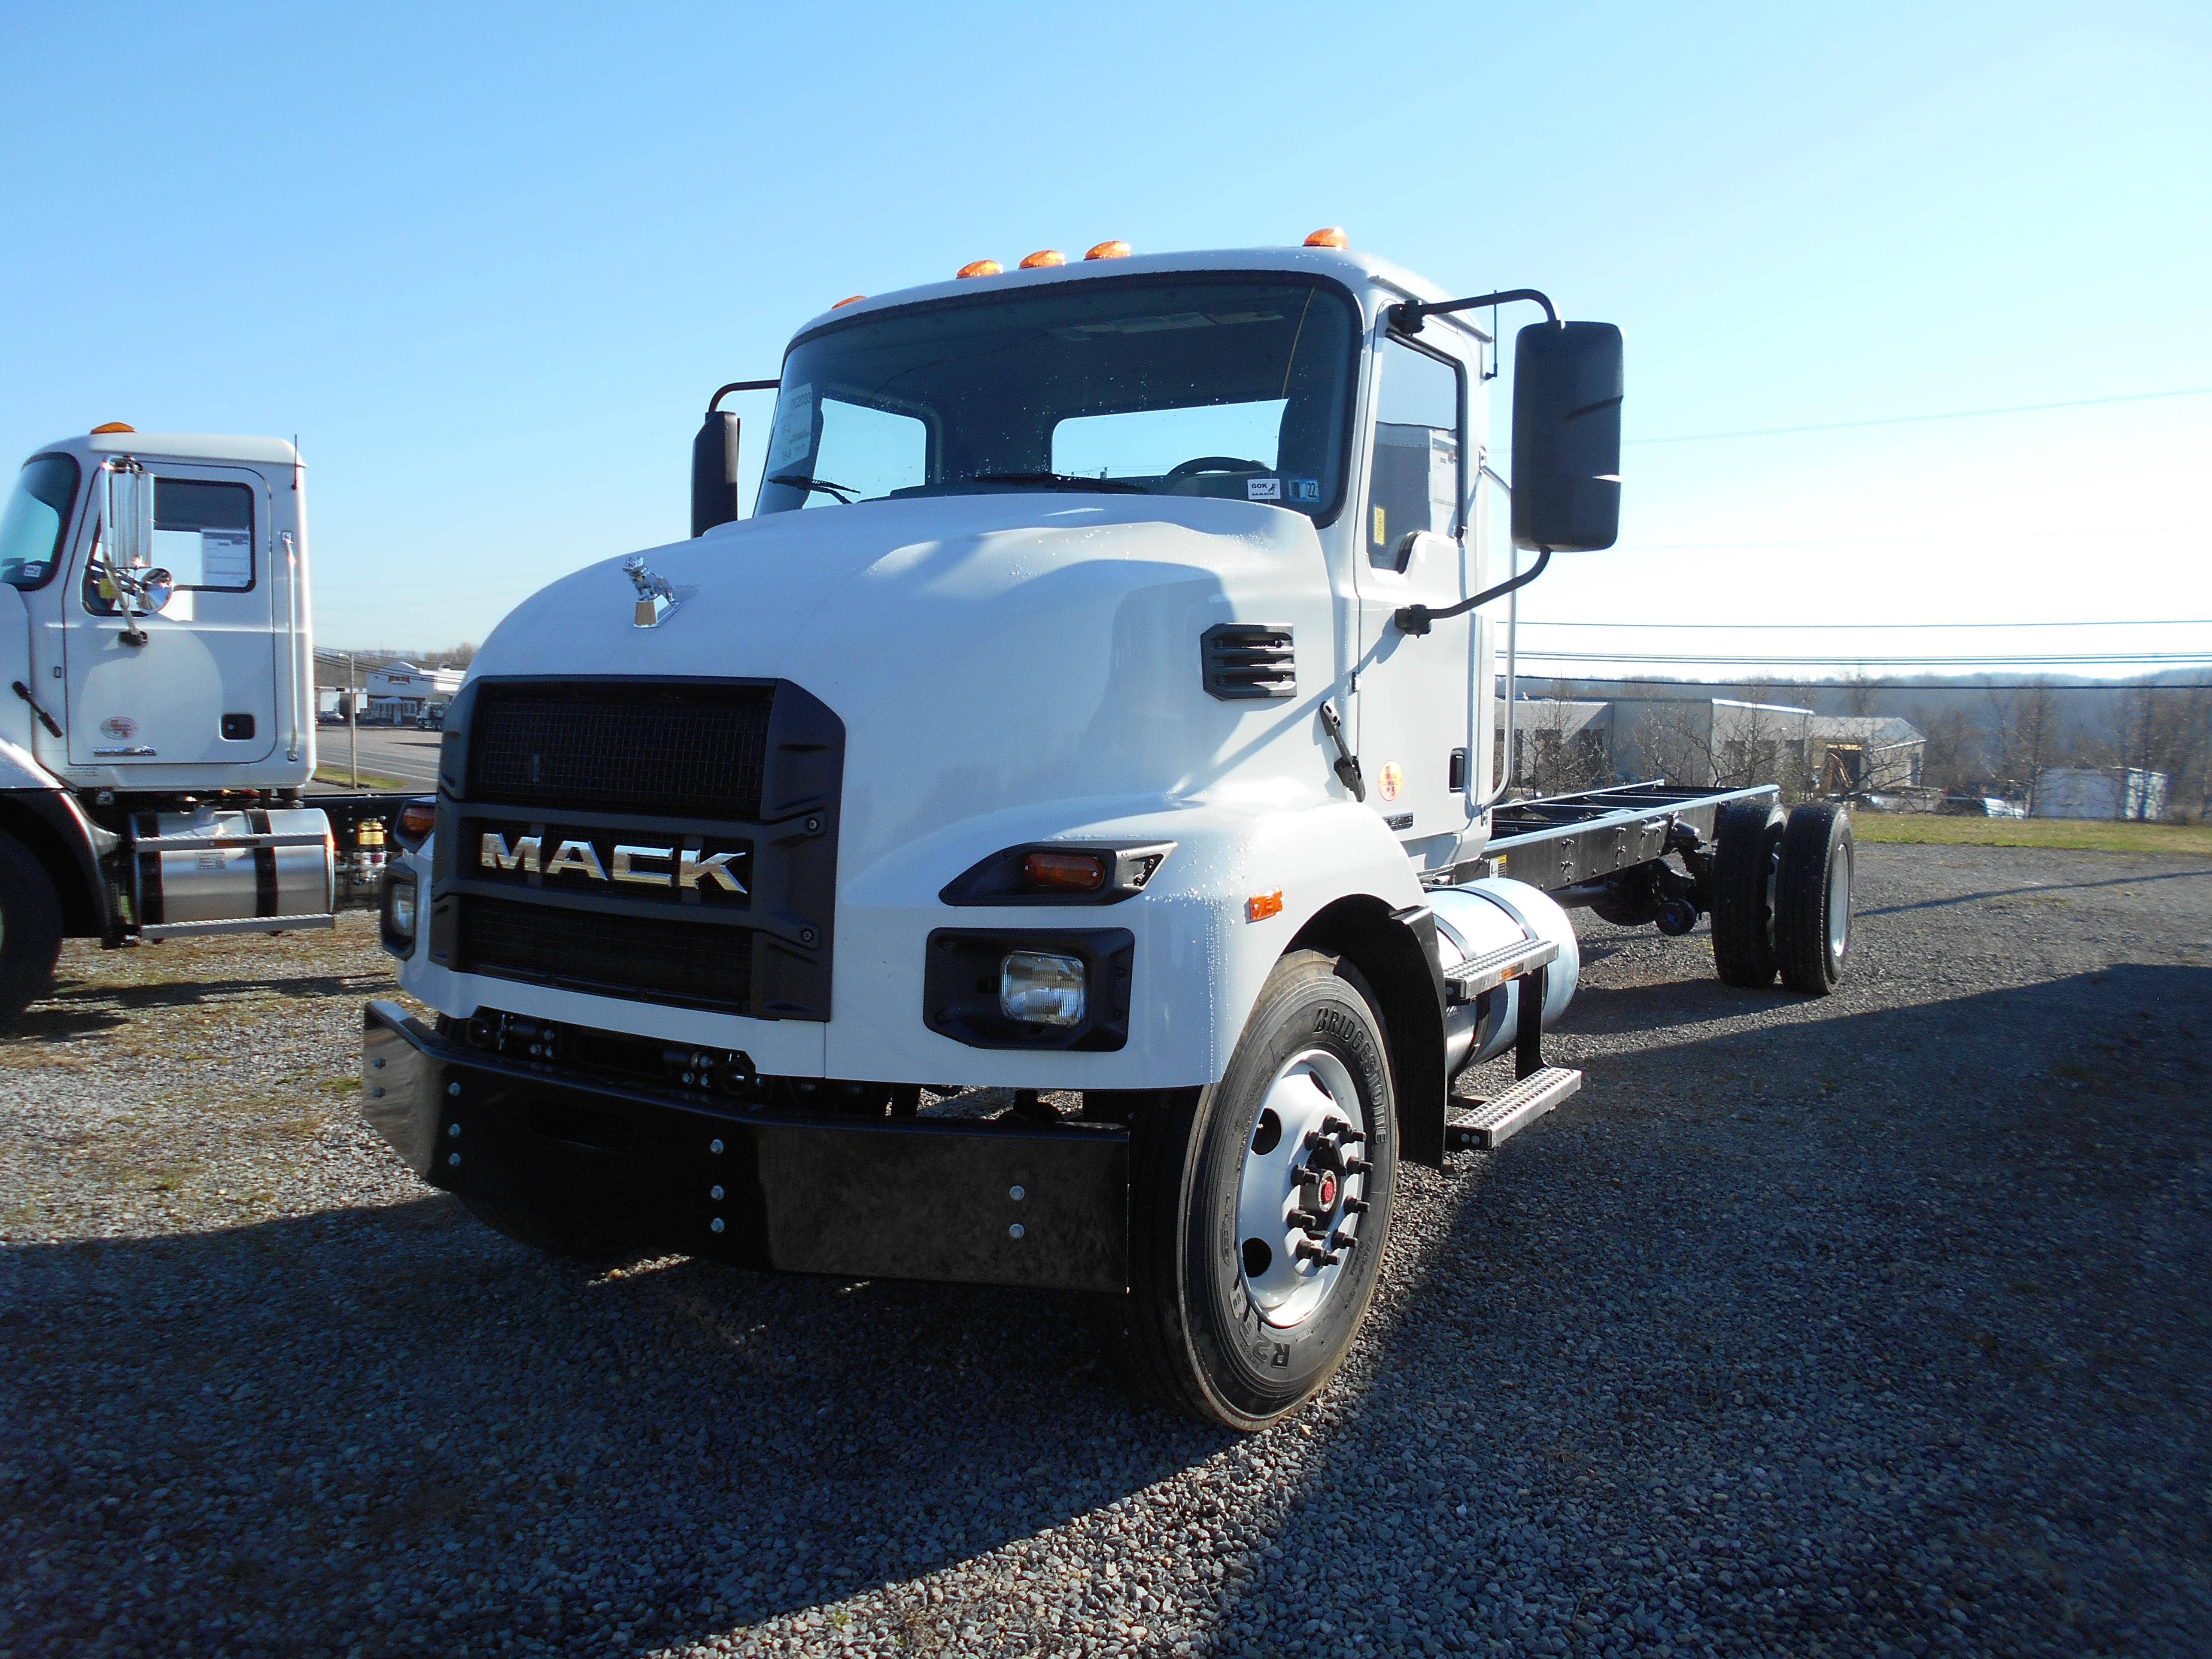 New, 2022, Mack, MD6, Cab / Chassis Trucks